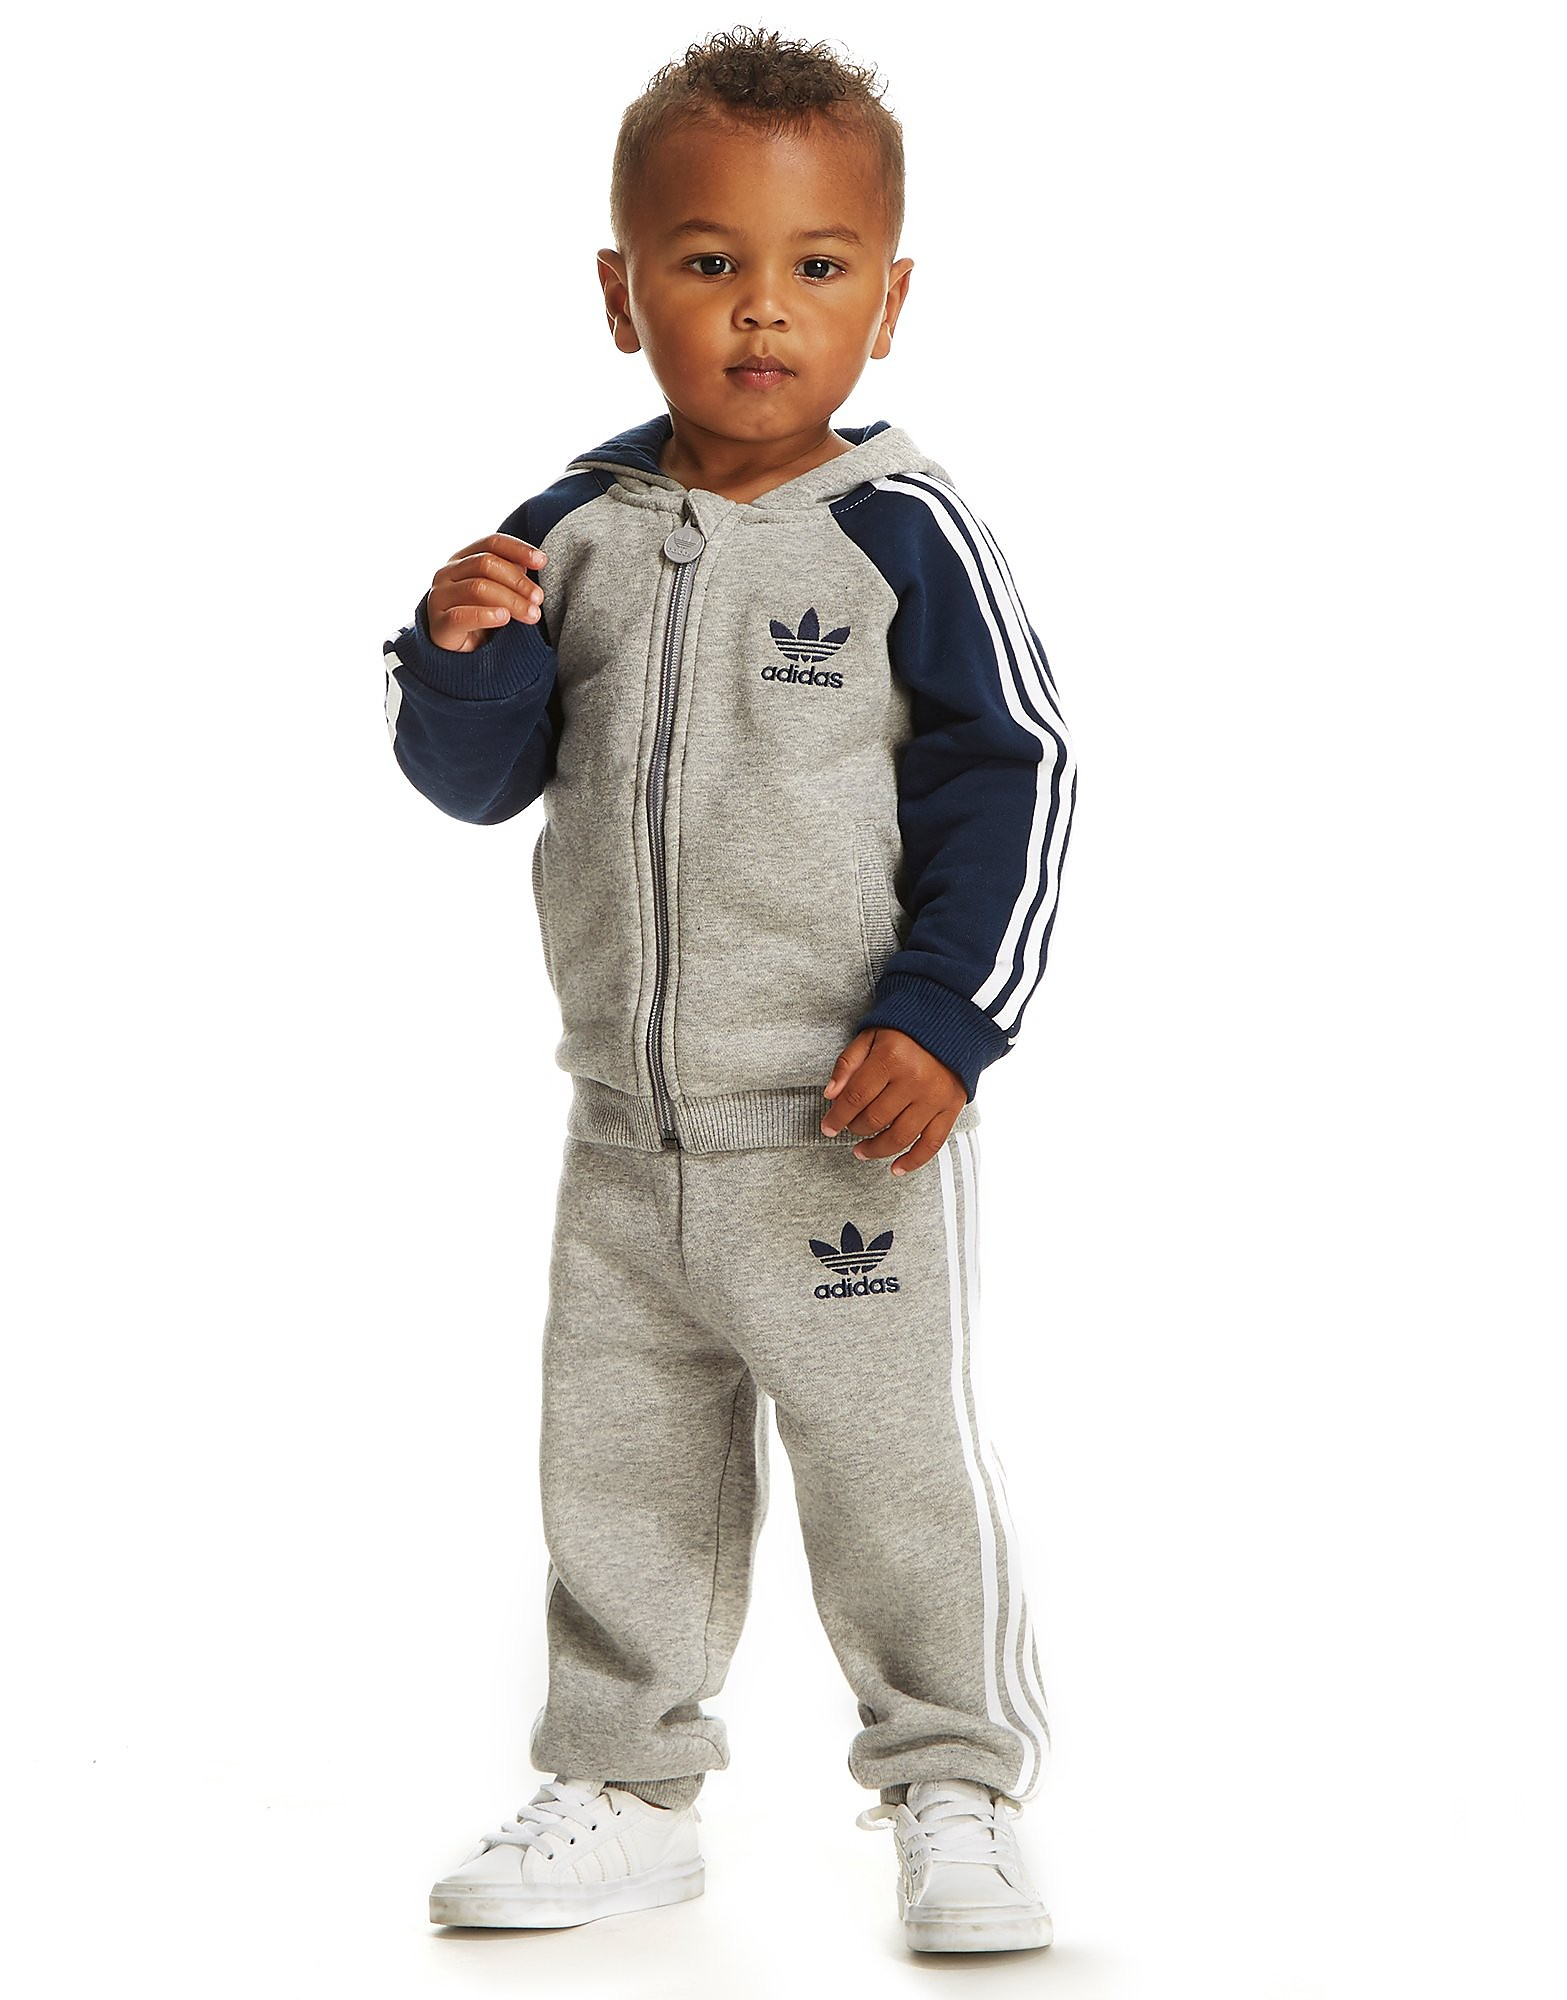 adidas Originals Hooded Suit Infant